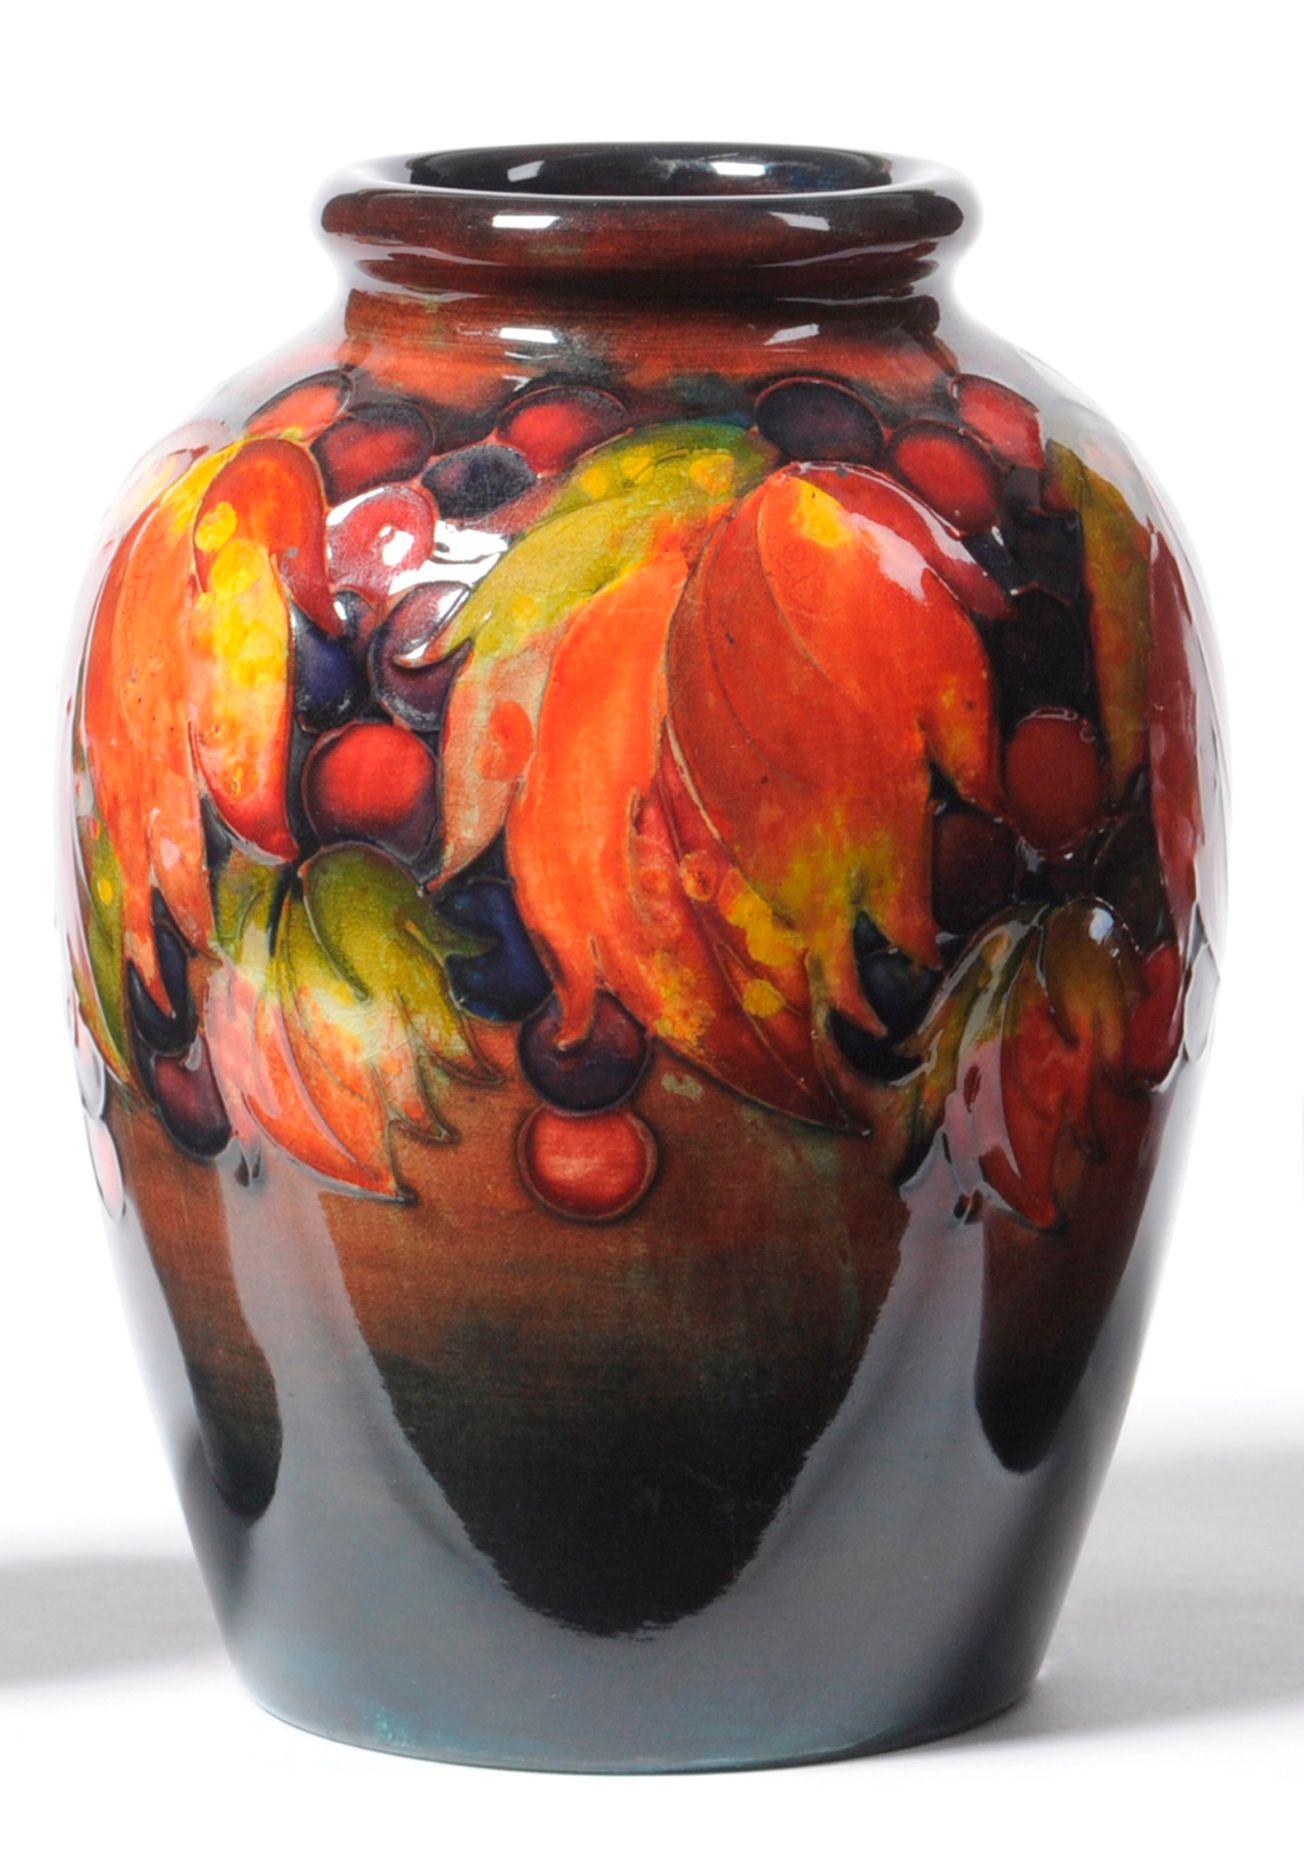 Tennants auctioneers a william moorcroft leaf and berry flambe tennants auctioneers a william moorcroft leaf and berry flambe vase reviewsmspy